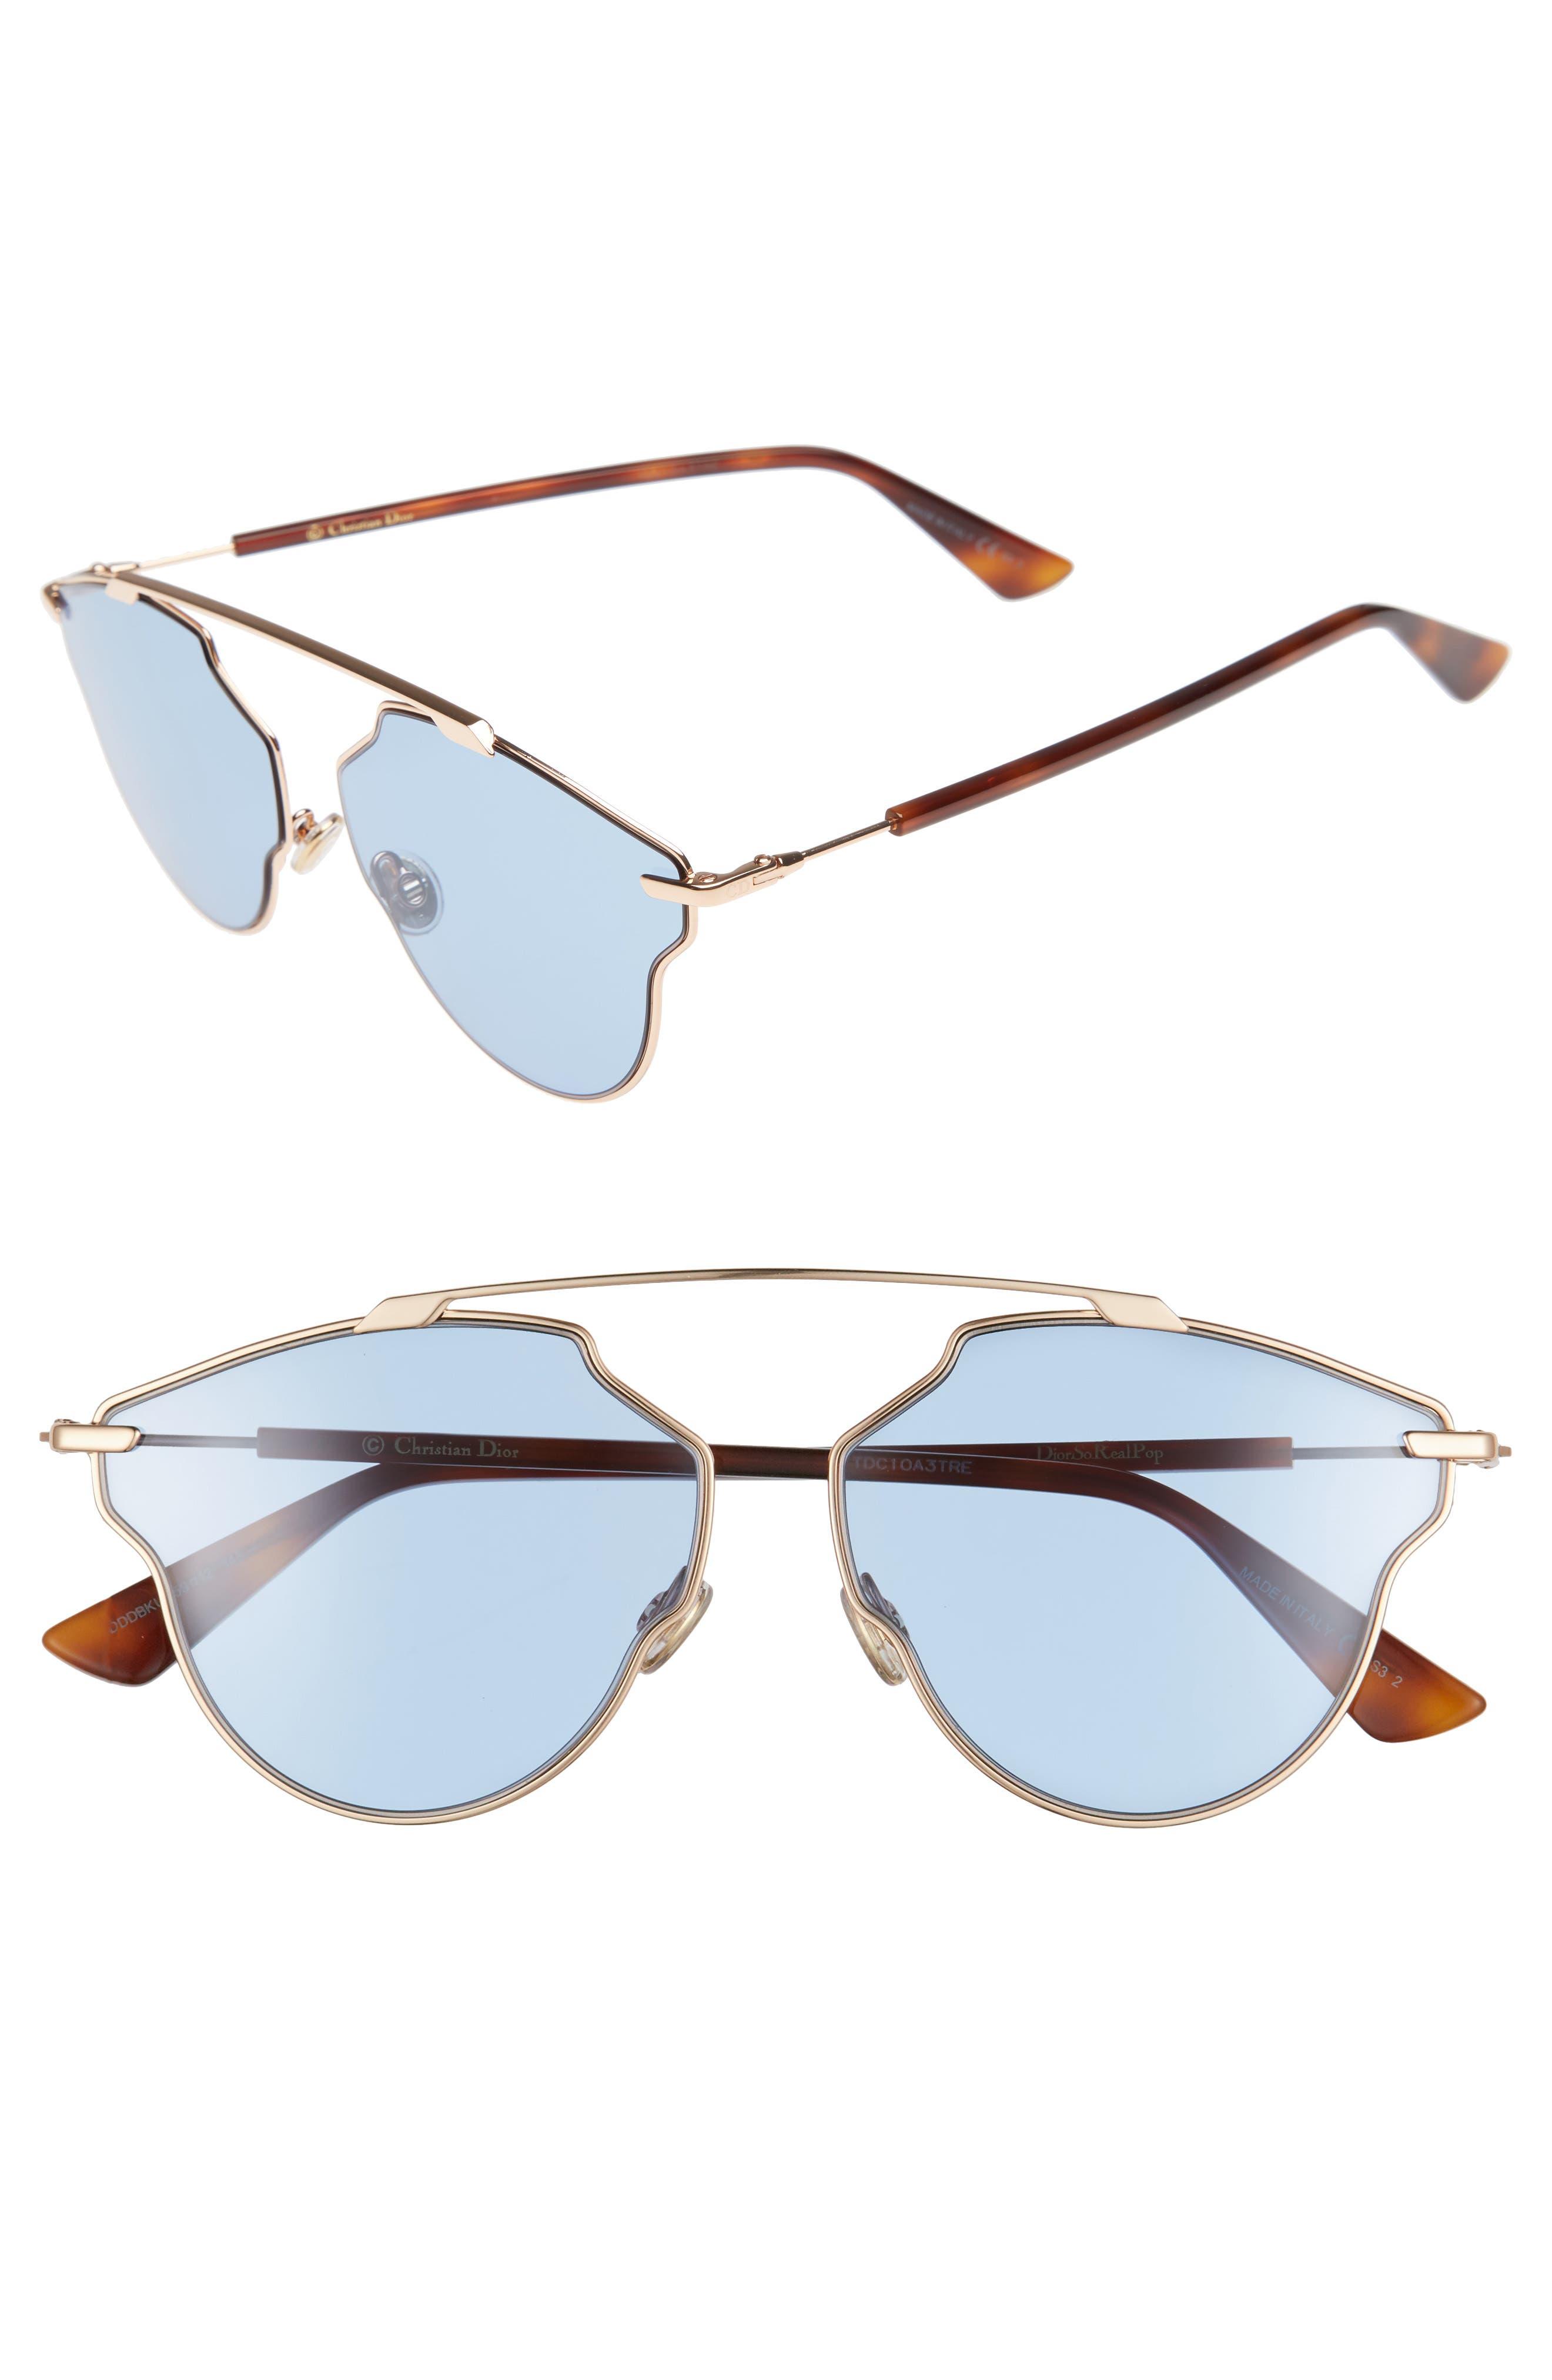 Alternate Image 1 Selected - Dior 448 Dior 59mm Sunglasses